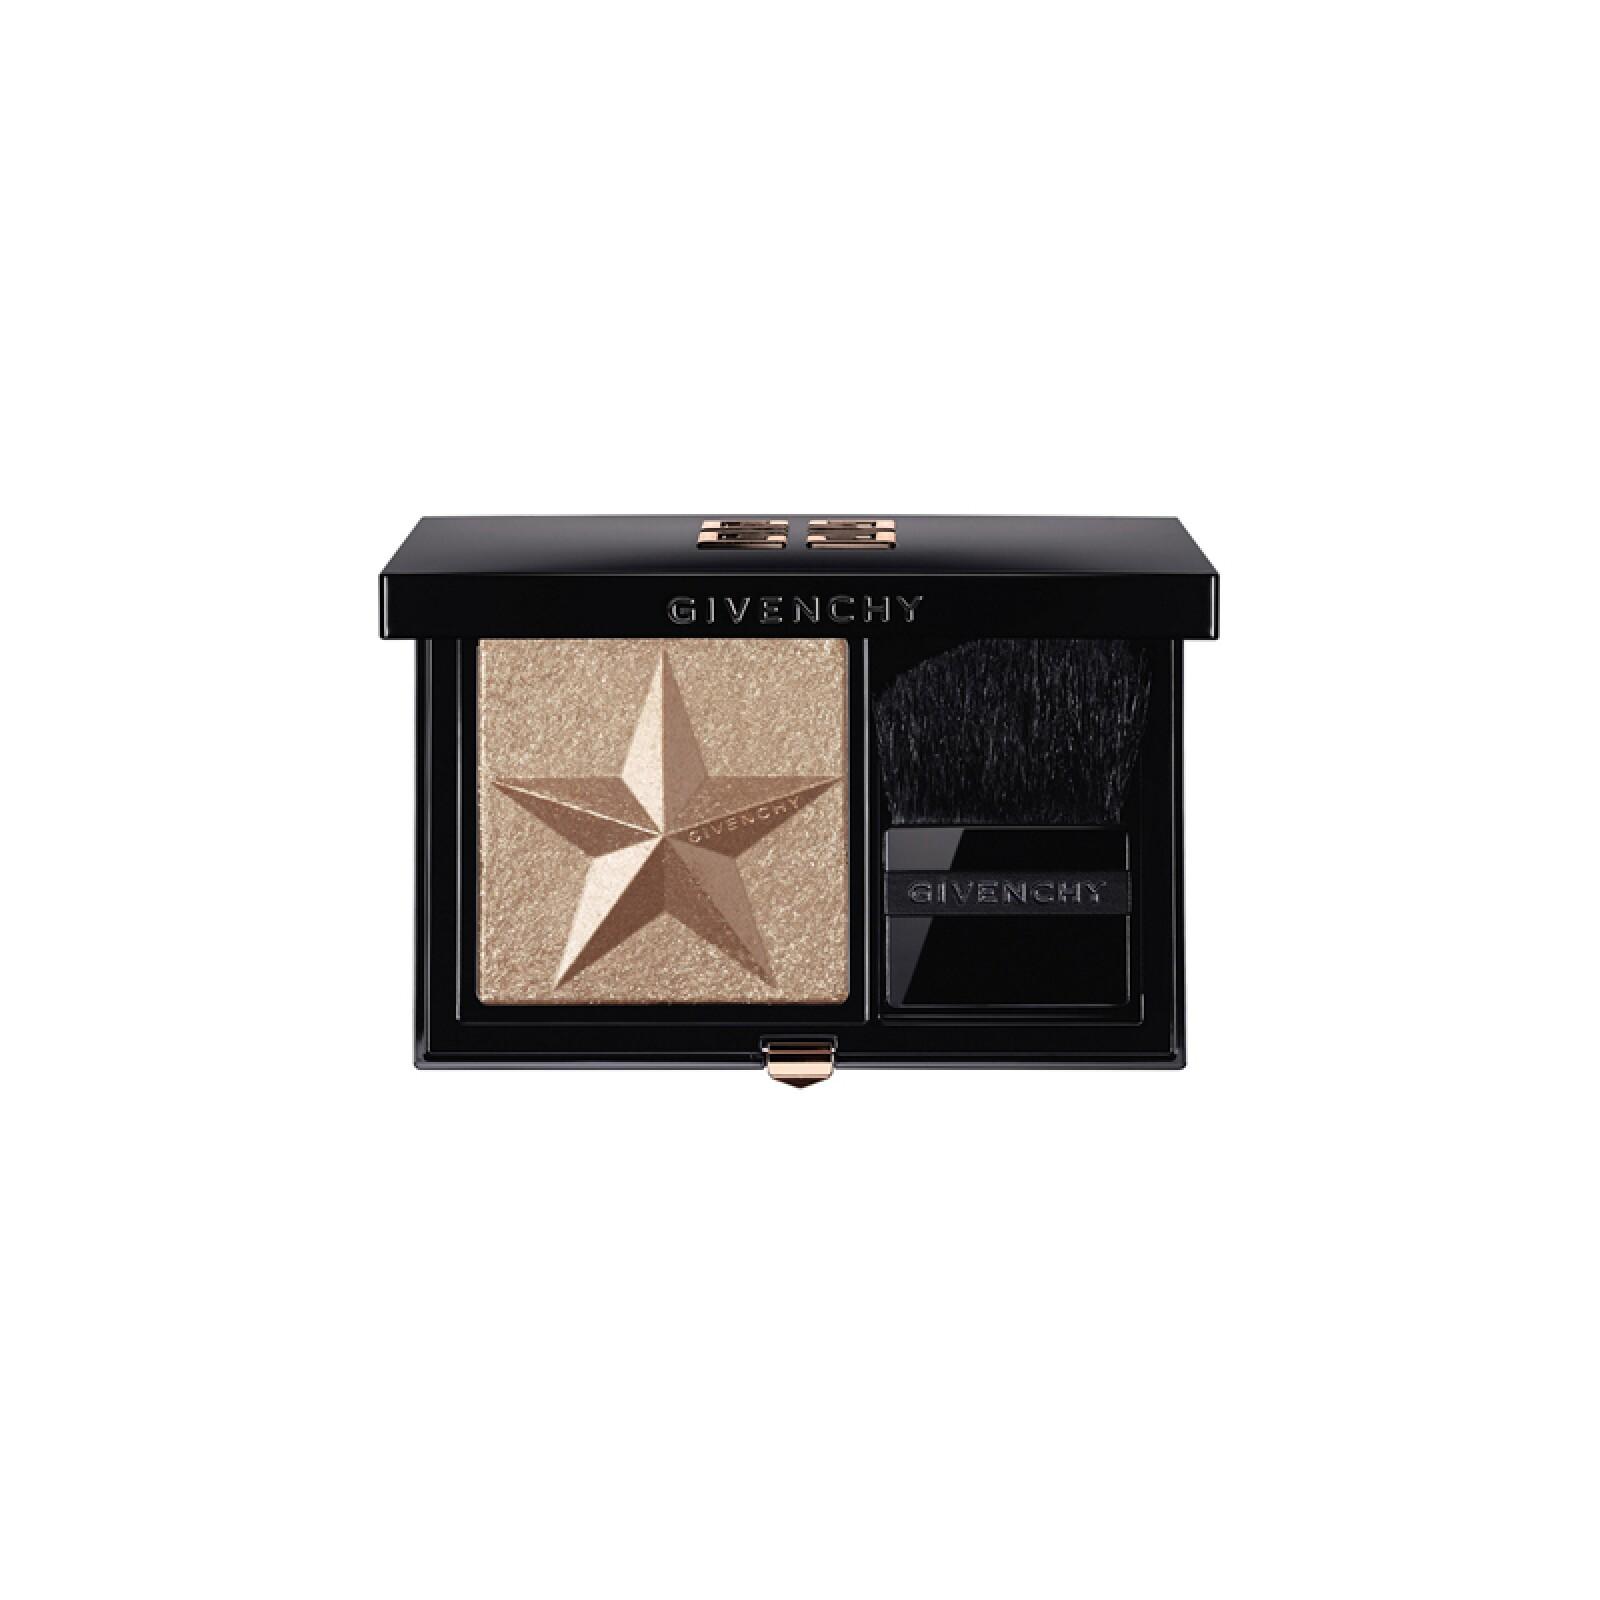 productos-maquillaje-skincare-belleza-beauty-rutina-givenchy